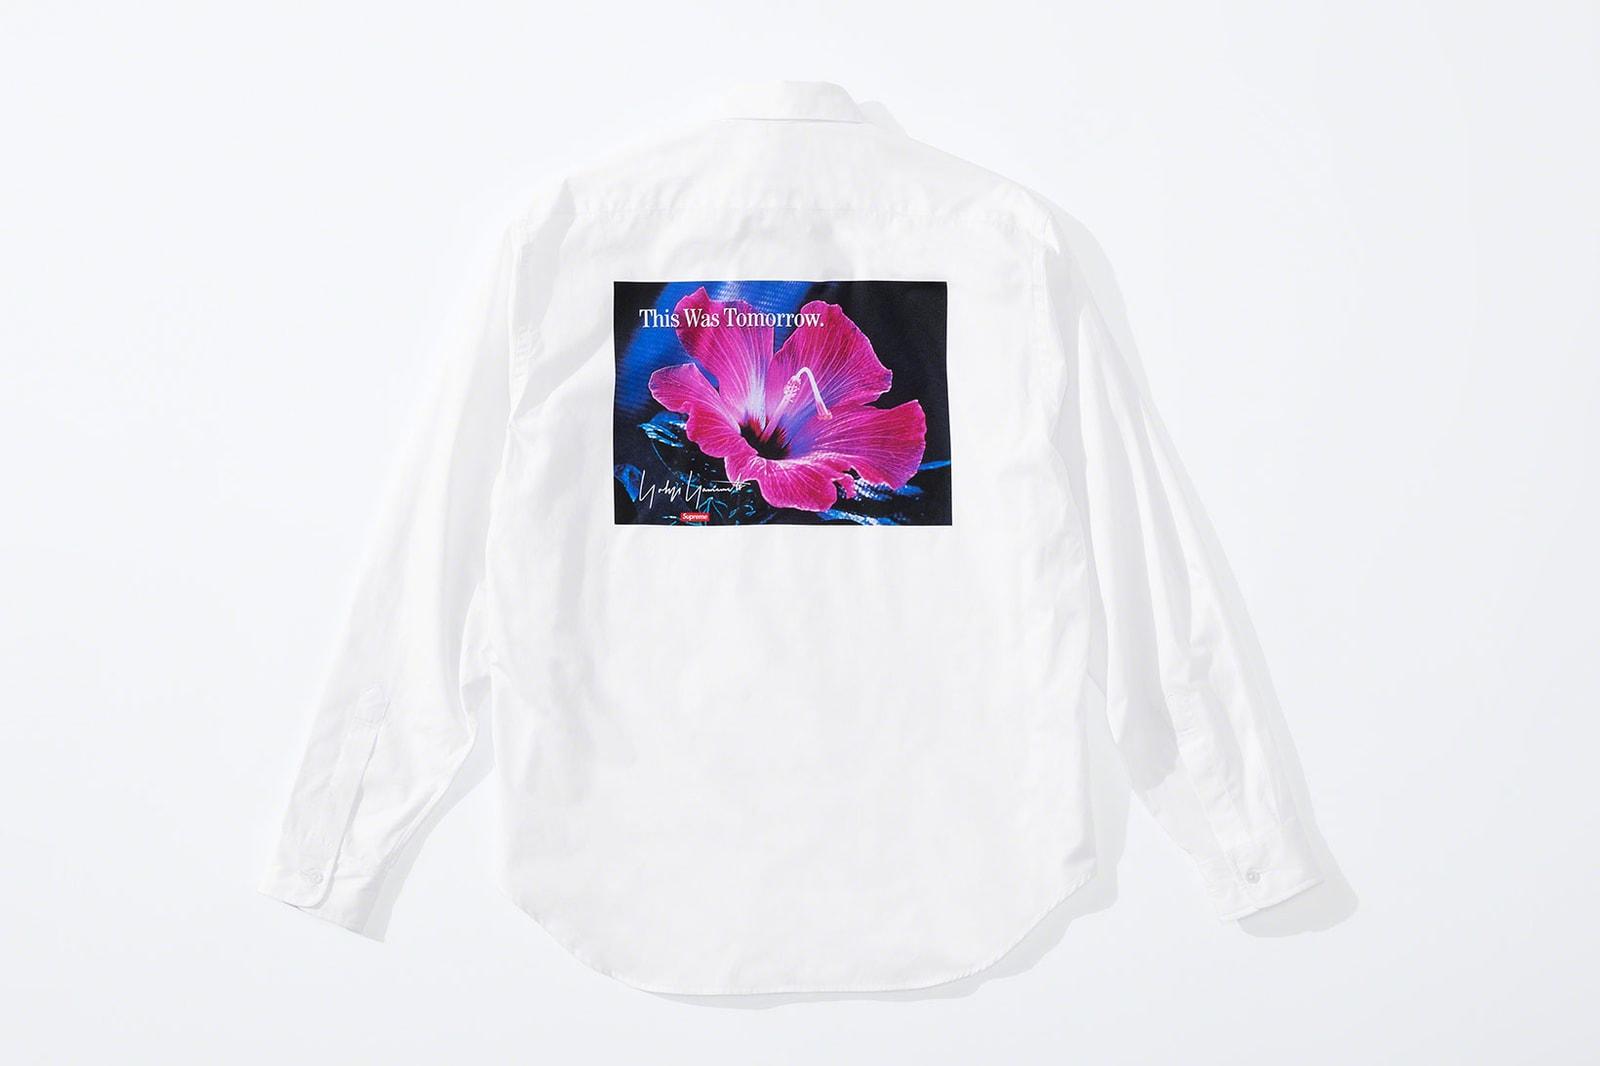 supreme yohji yamamoto collaboration lookbook puffers suits jackets knit sweaters hoodies release info